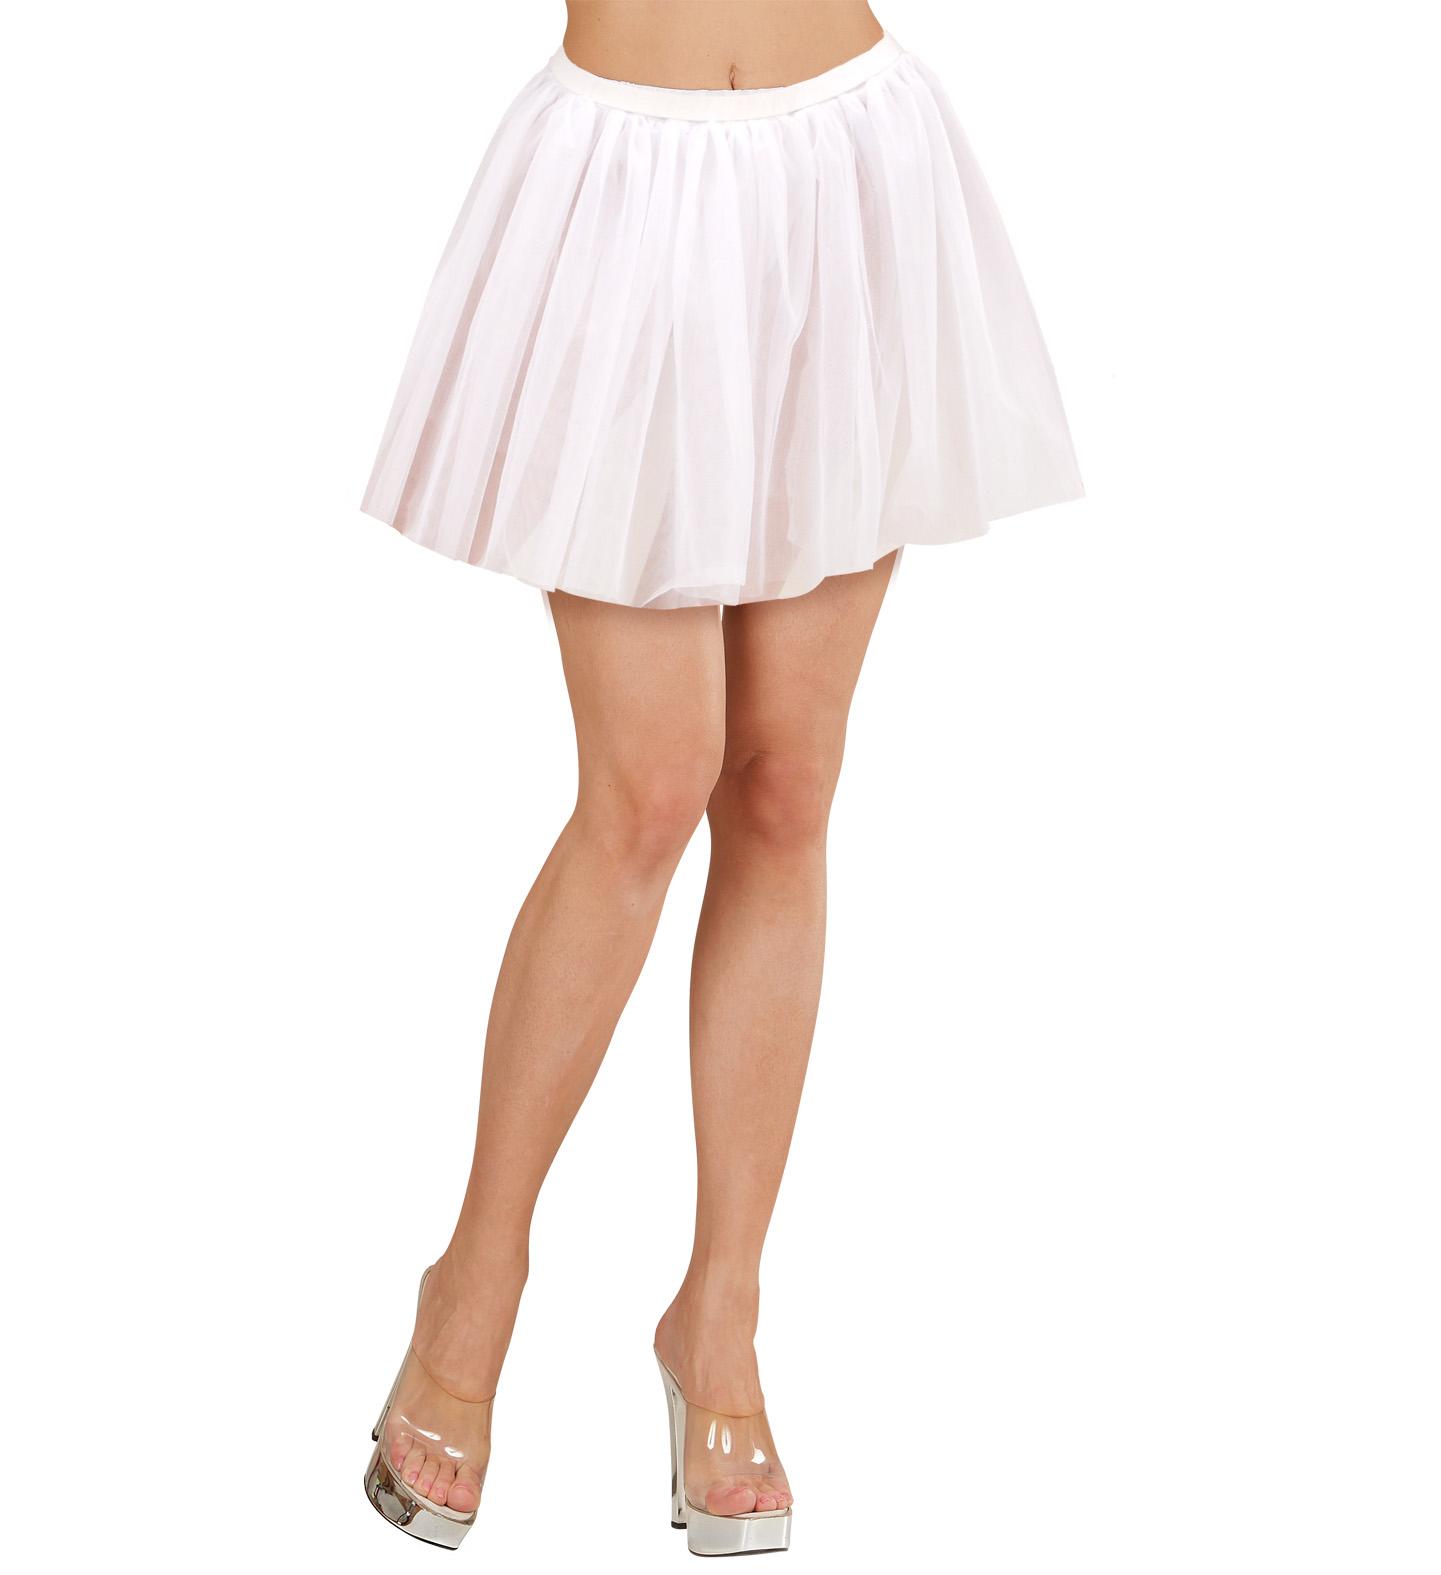 Tutu - Adult Size - Tutu Rara Skirt Fancy Dress